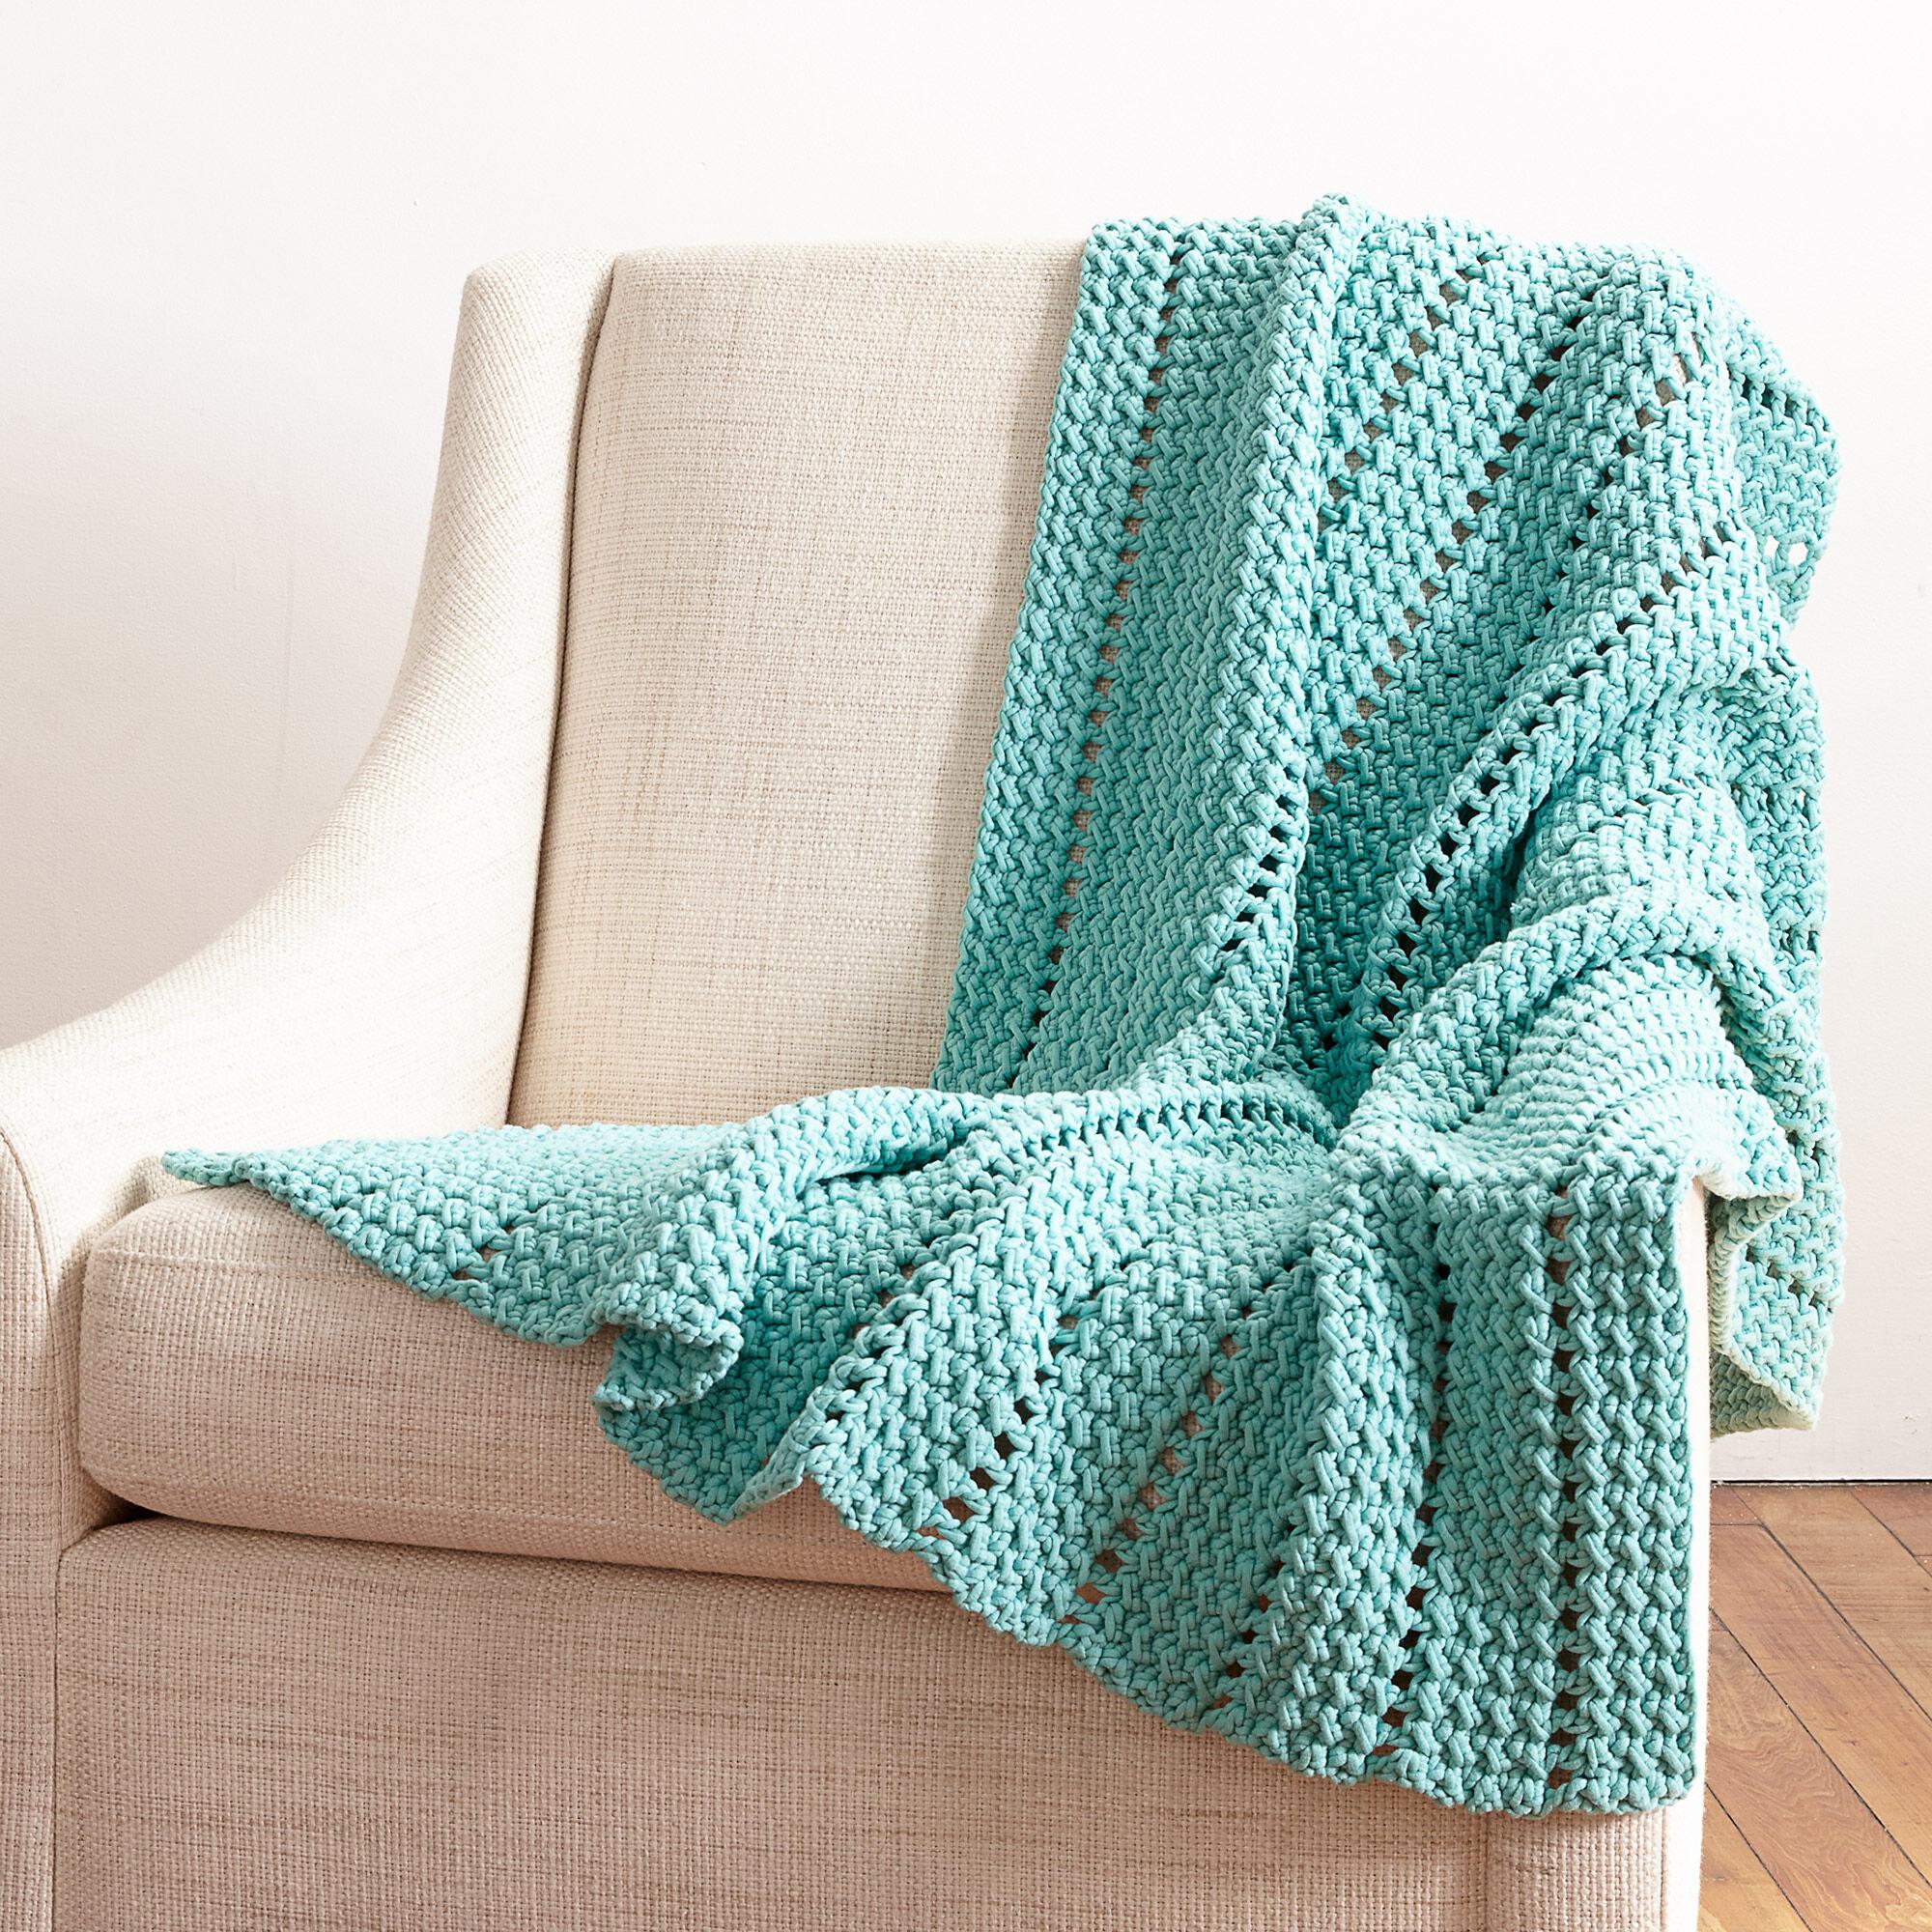 Bernat Eyelets and Textures Blanket | Yarnspirations